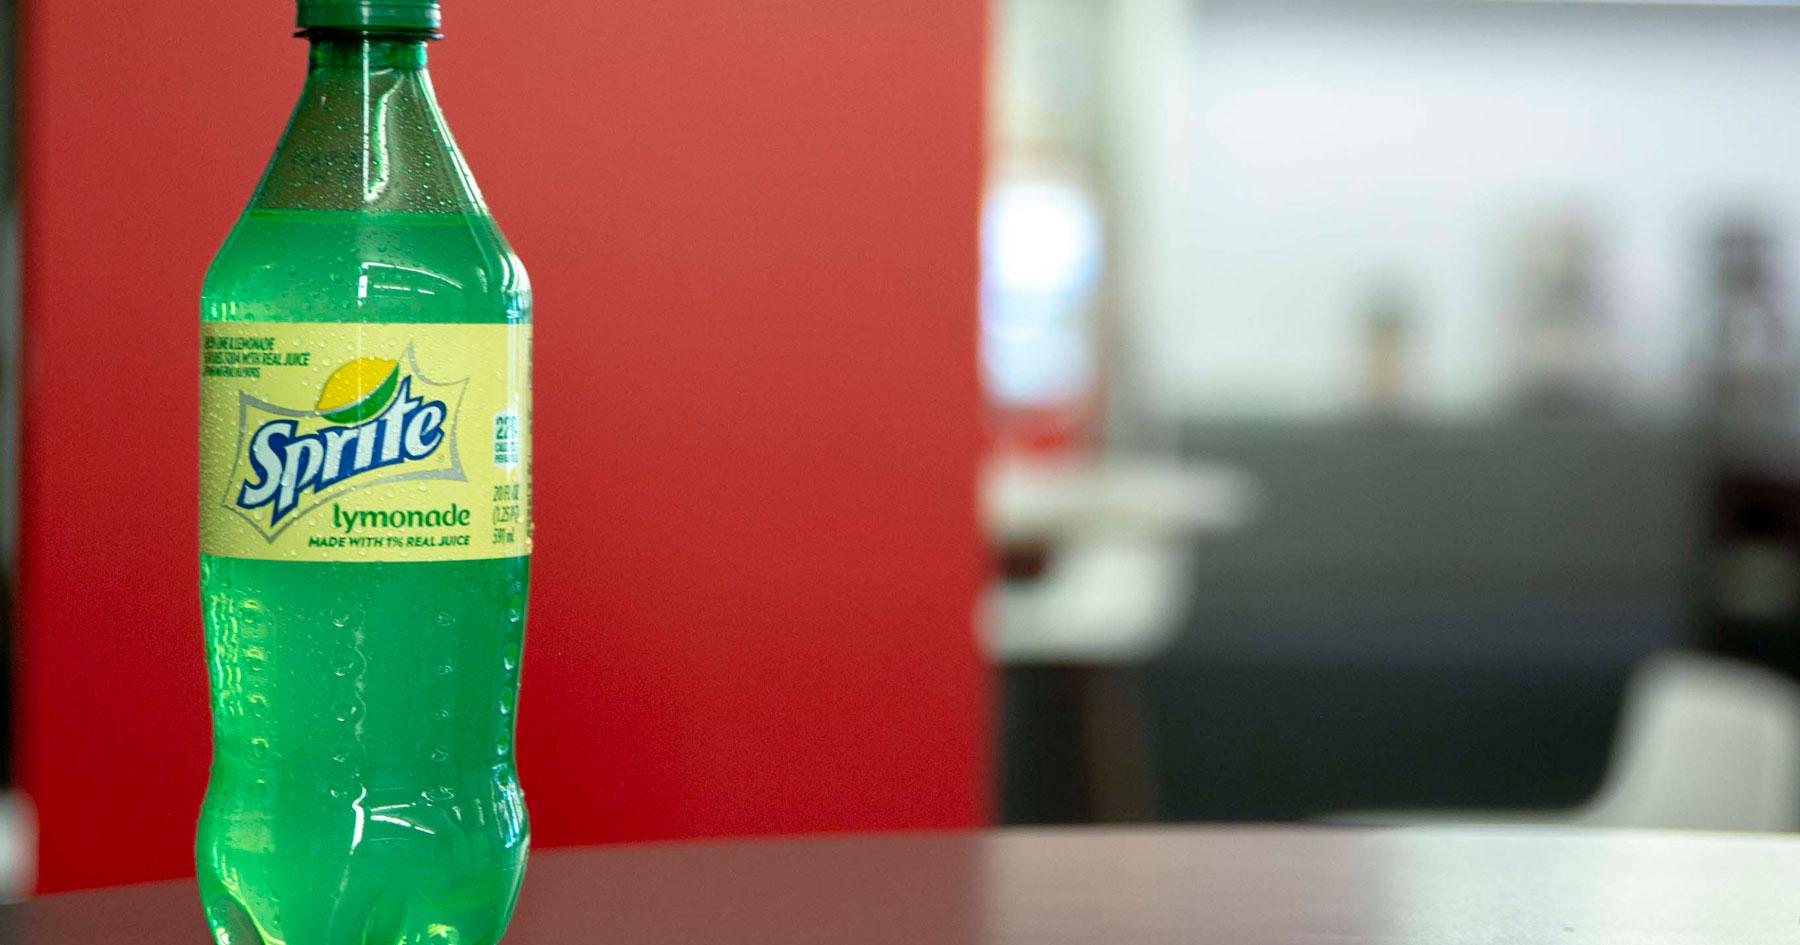 Sprite ?adds A Subtle Splash Of Lemonade? photo